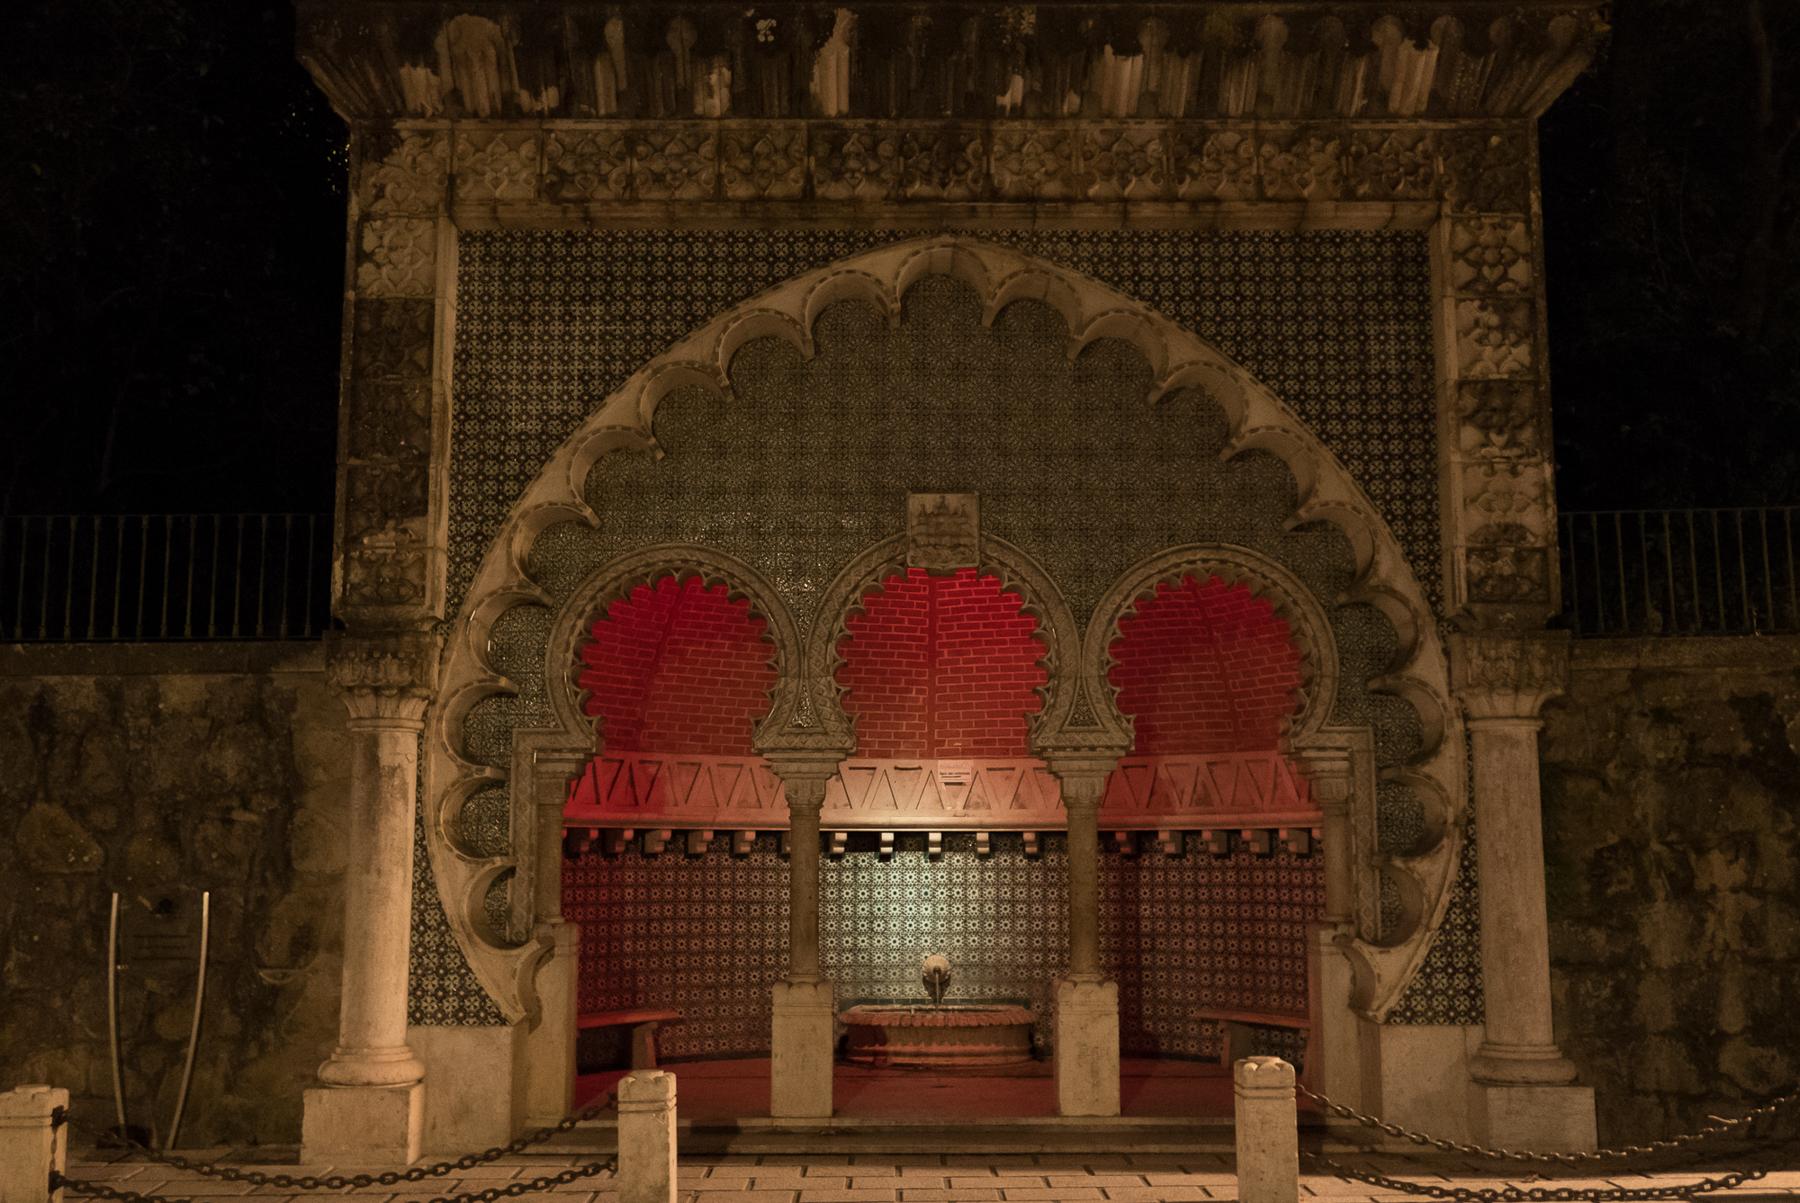 Photo workshops in Lisbon and the Algarve- Sintra, Arabesque pavilion